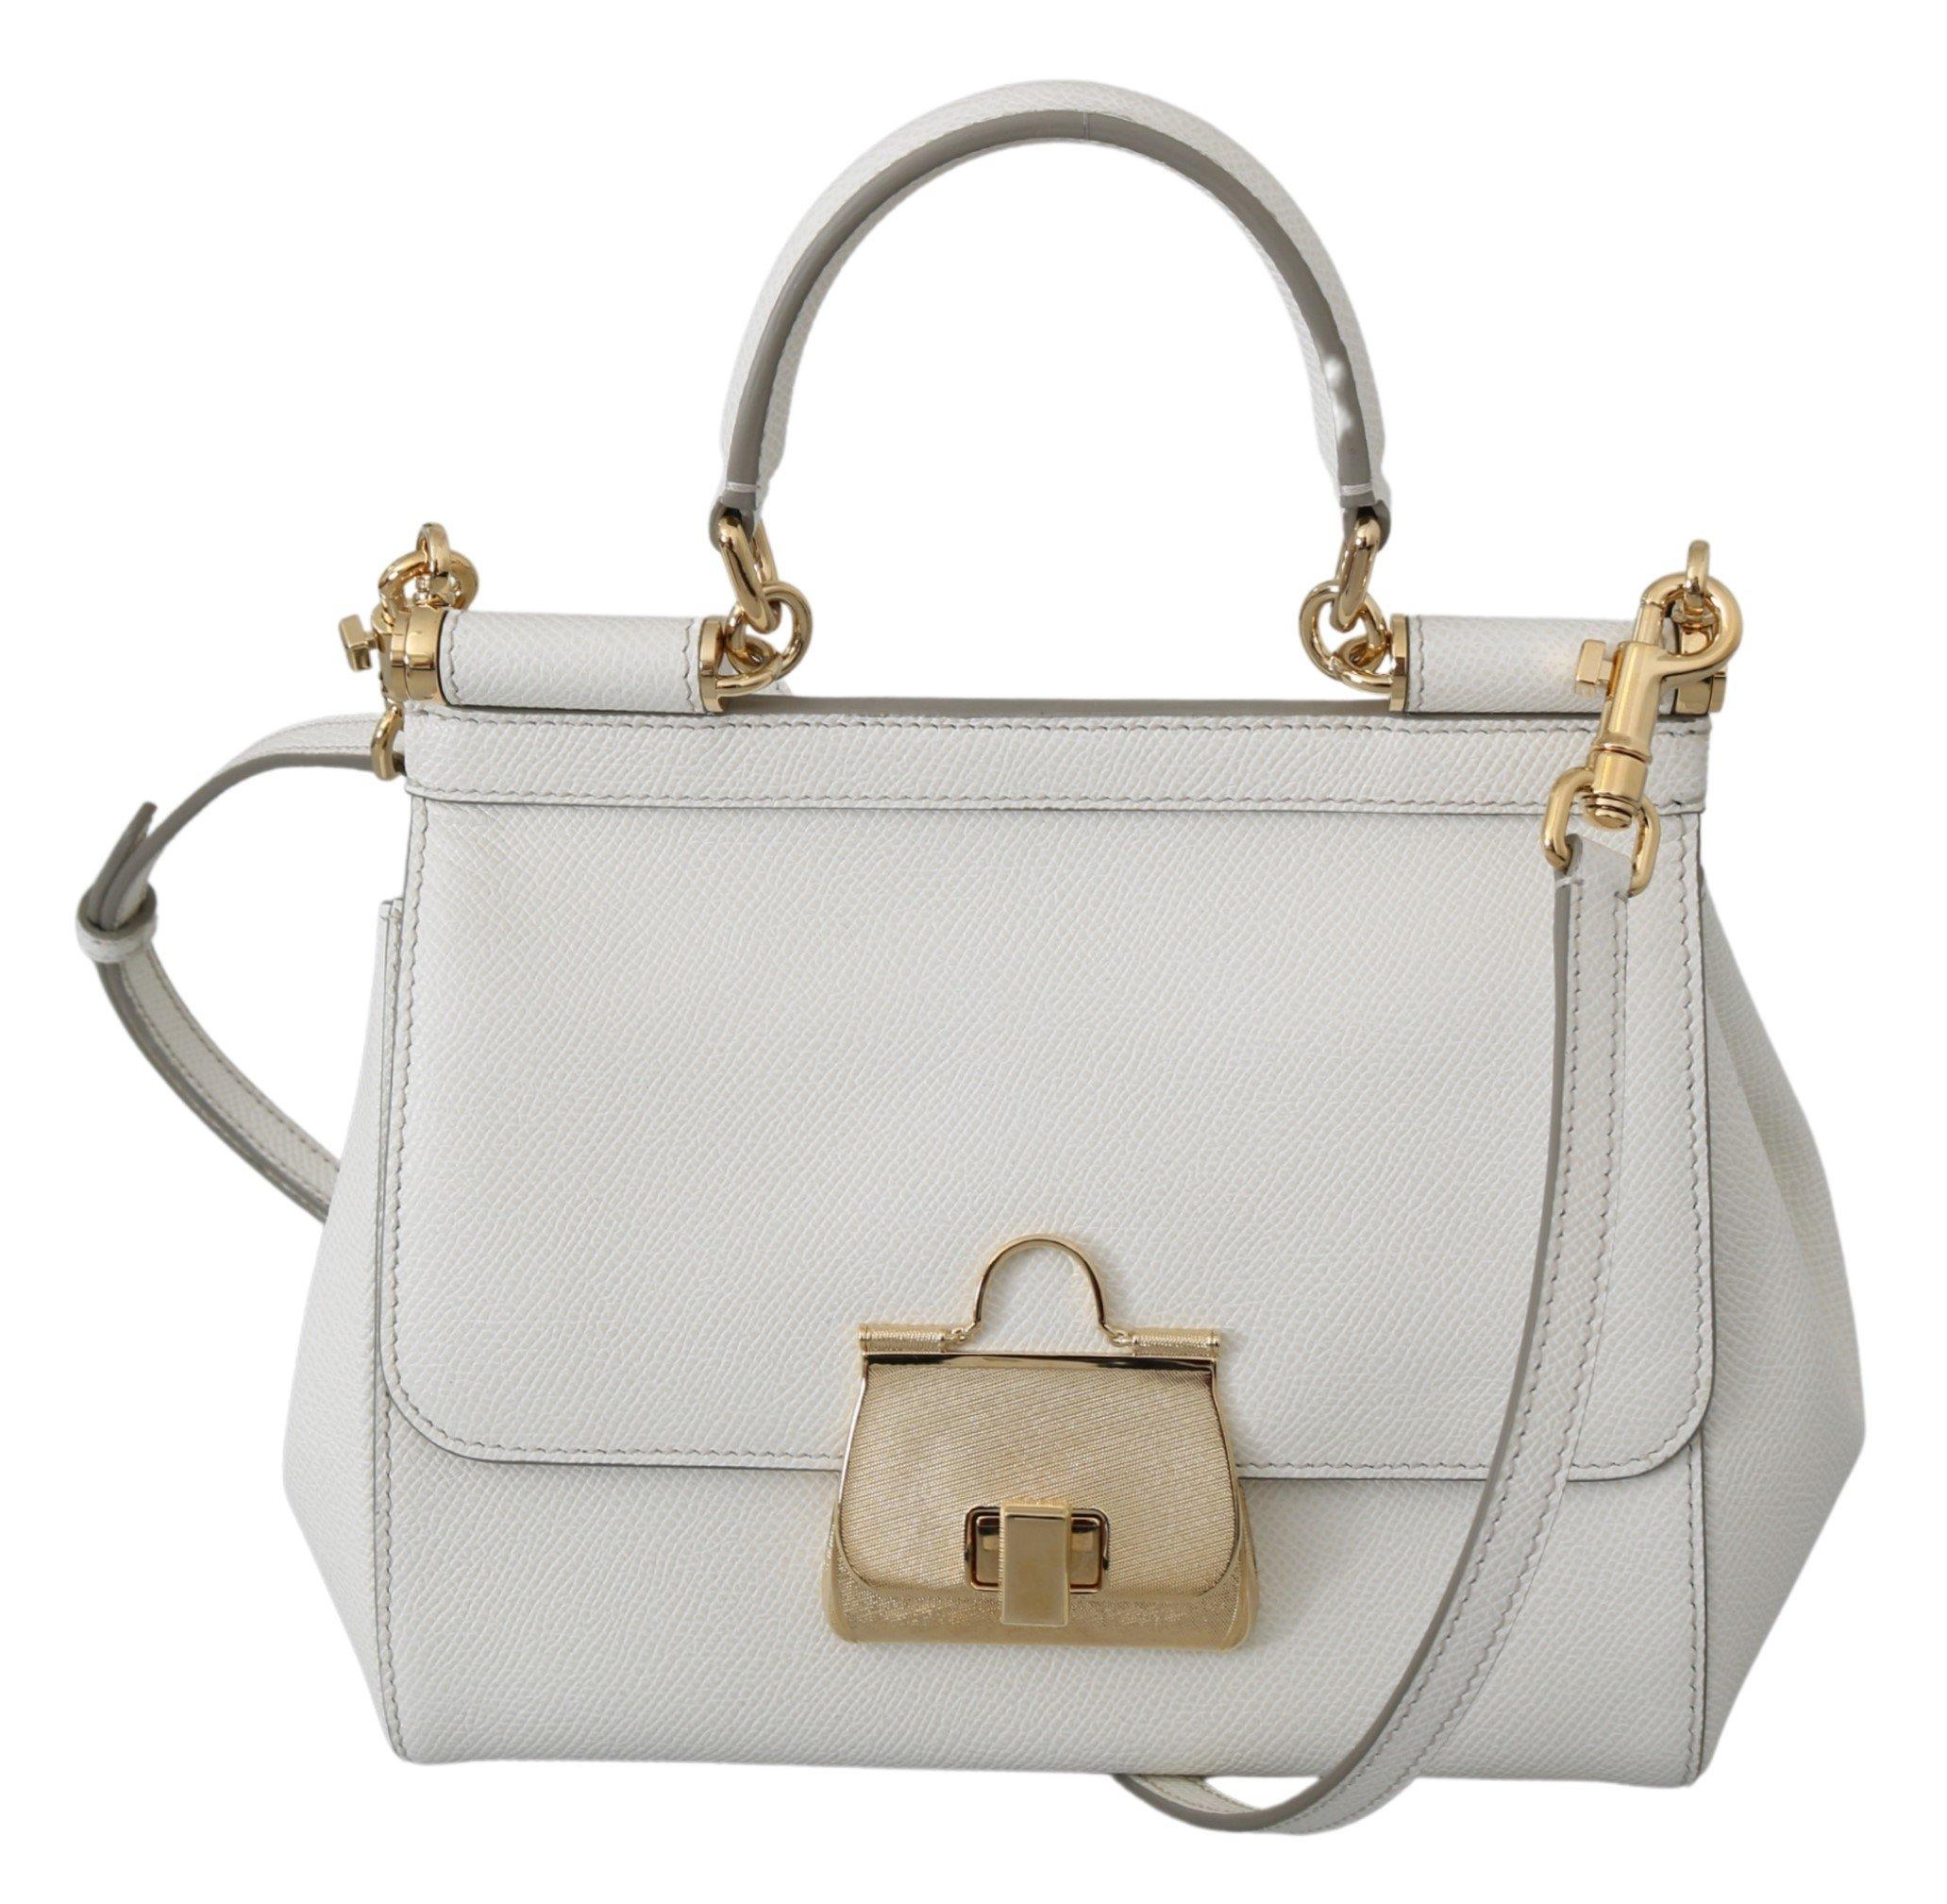 Dolce & Gabbana Women's SICILY Leather Shoulder Bag White VAS9950